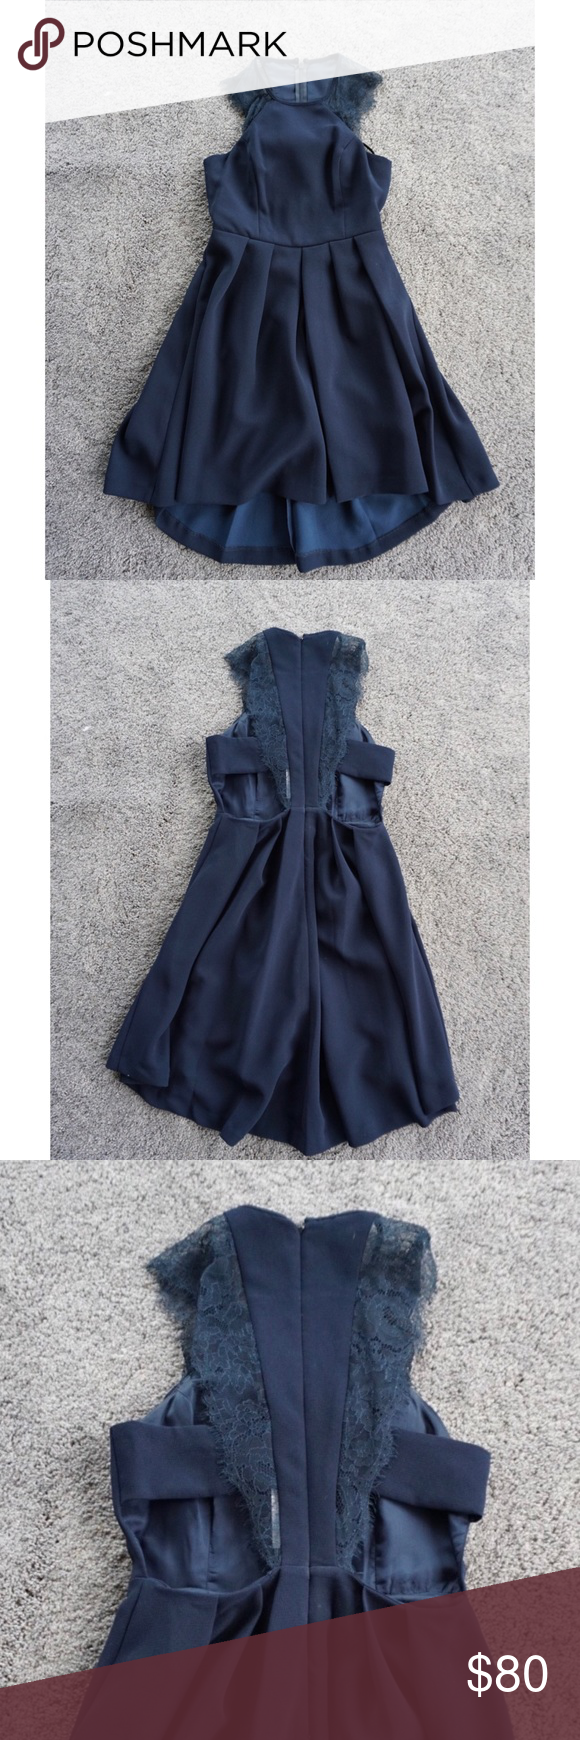 Navy blue dress size 0 images